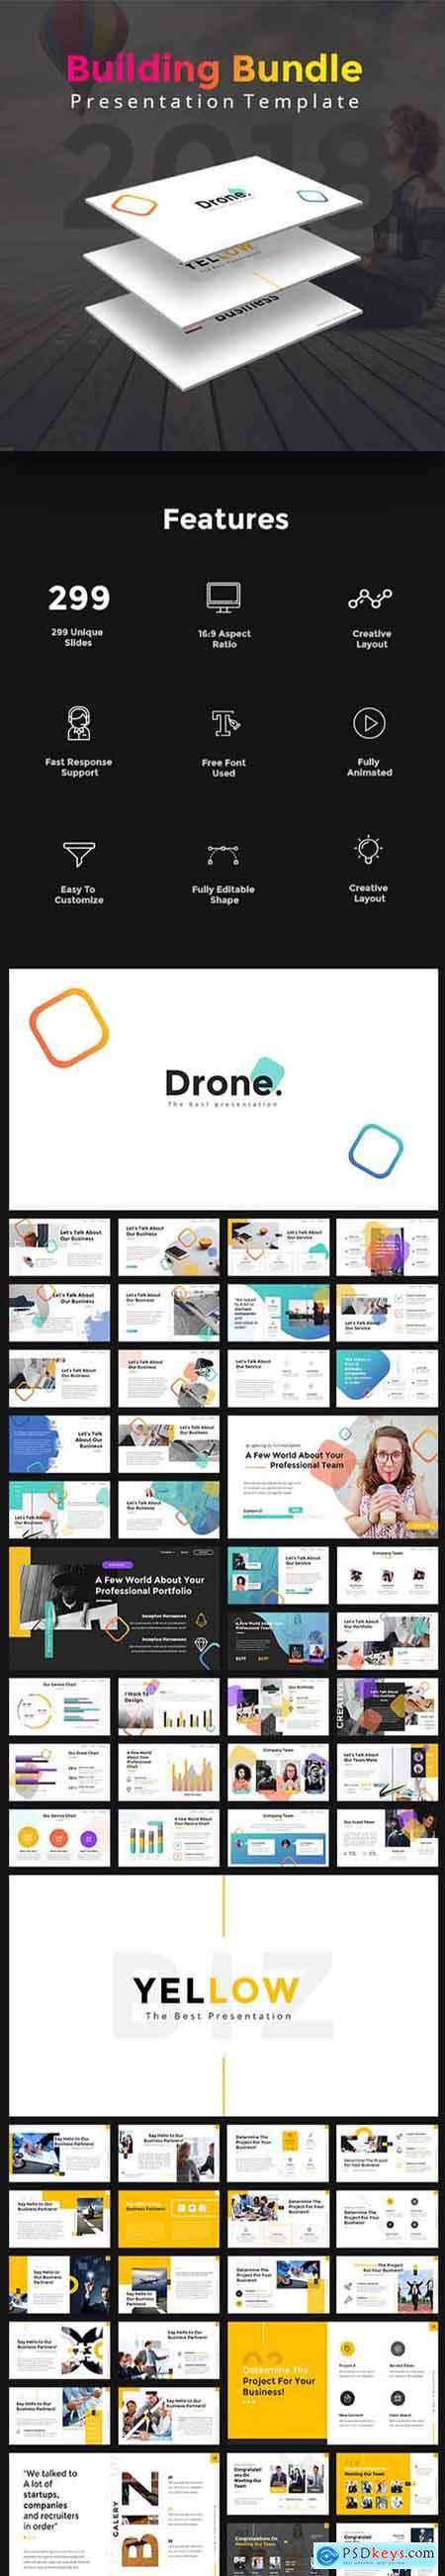 Building Bundle 2018 Powerpoint - PowerPoint Templates 22920005